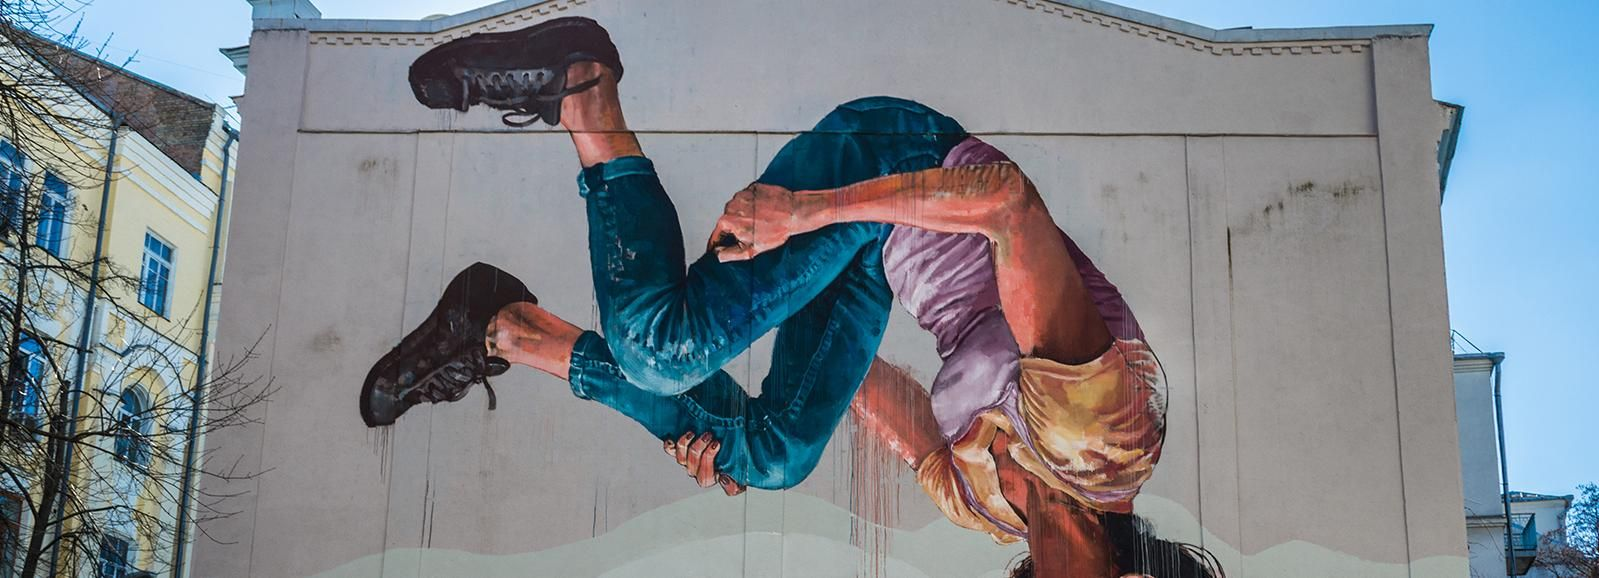 Kiev: 2-Hour Mural Art Walking Tour